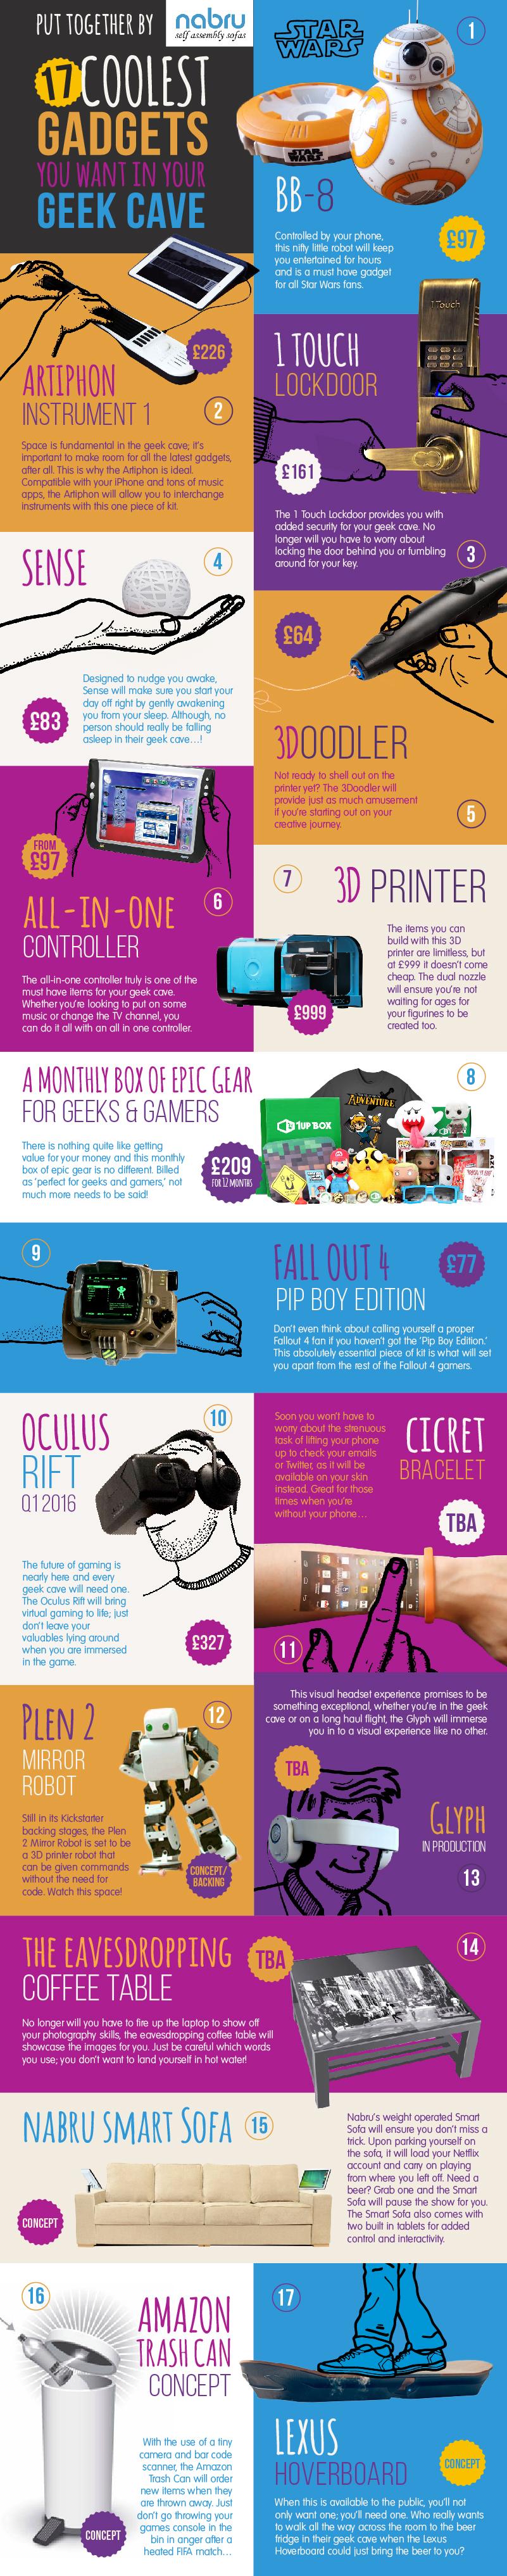 Nabru-infographic-geeky-gadgets